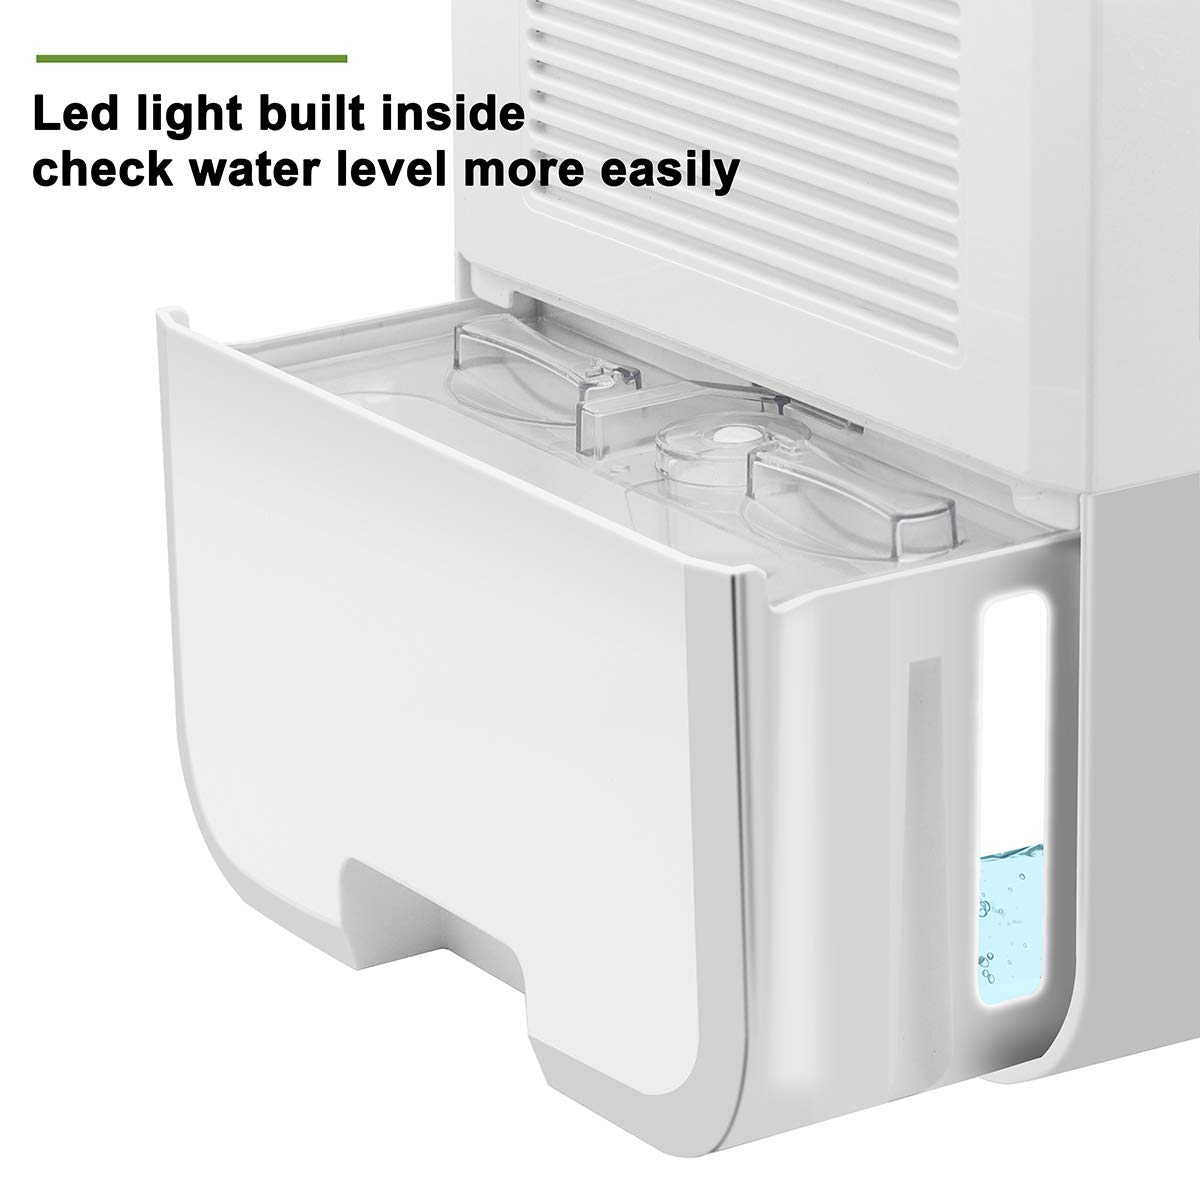 Dehumidifier Electric Mini Dehumidifiers for Home Basements Bathroom Bedroom Closet Wardrobe RV 2200 Cubic Feet 269 sq.ft Large 2L Tank Smart Control Dehumidifier